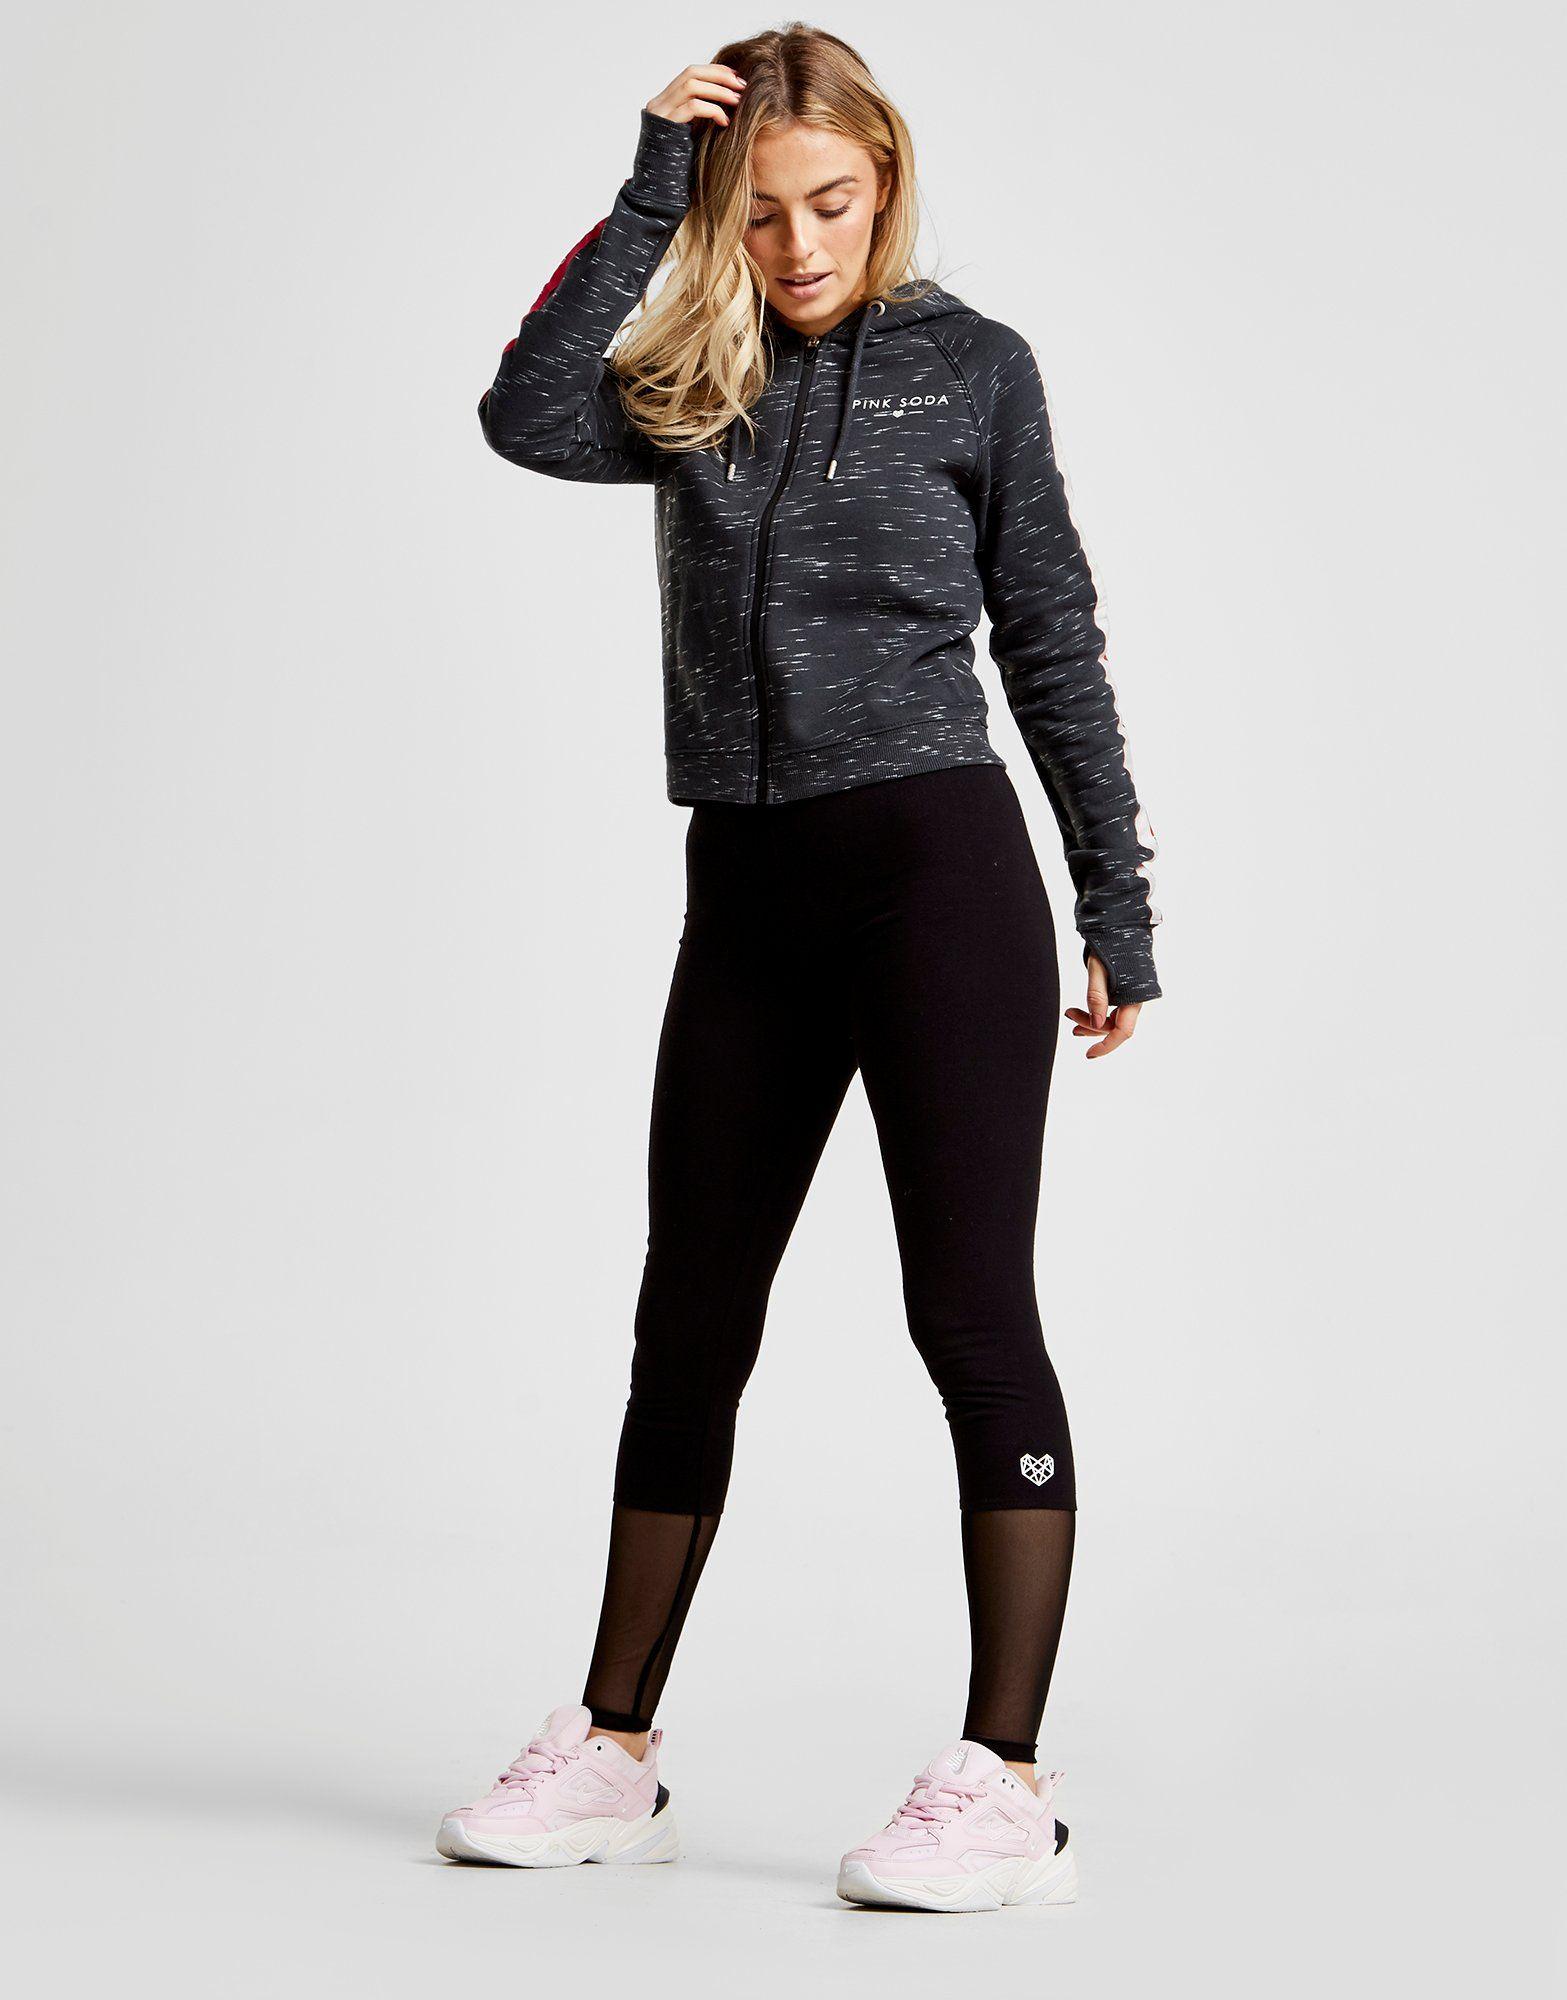 Pink Soda Sport Mesh Block Lifestyle Leggings